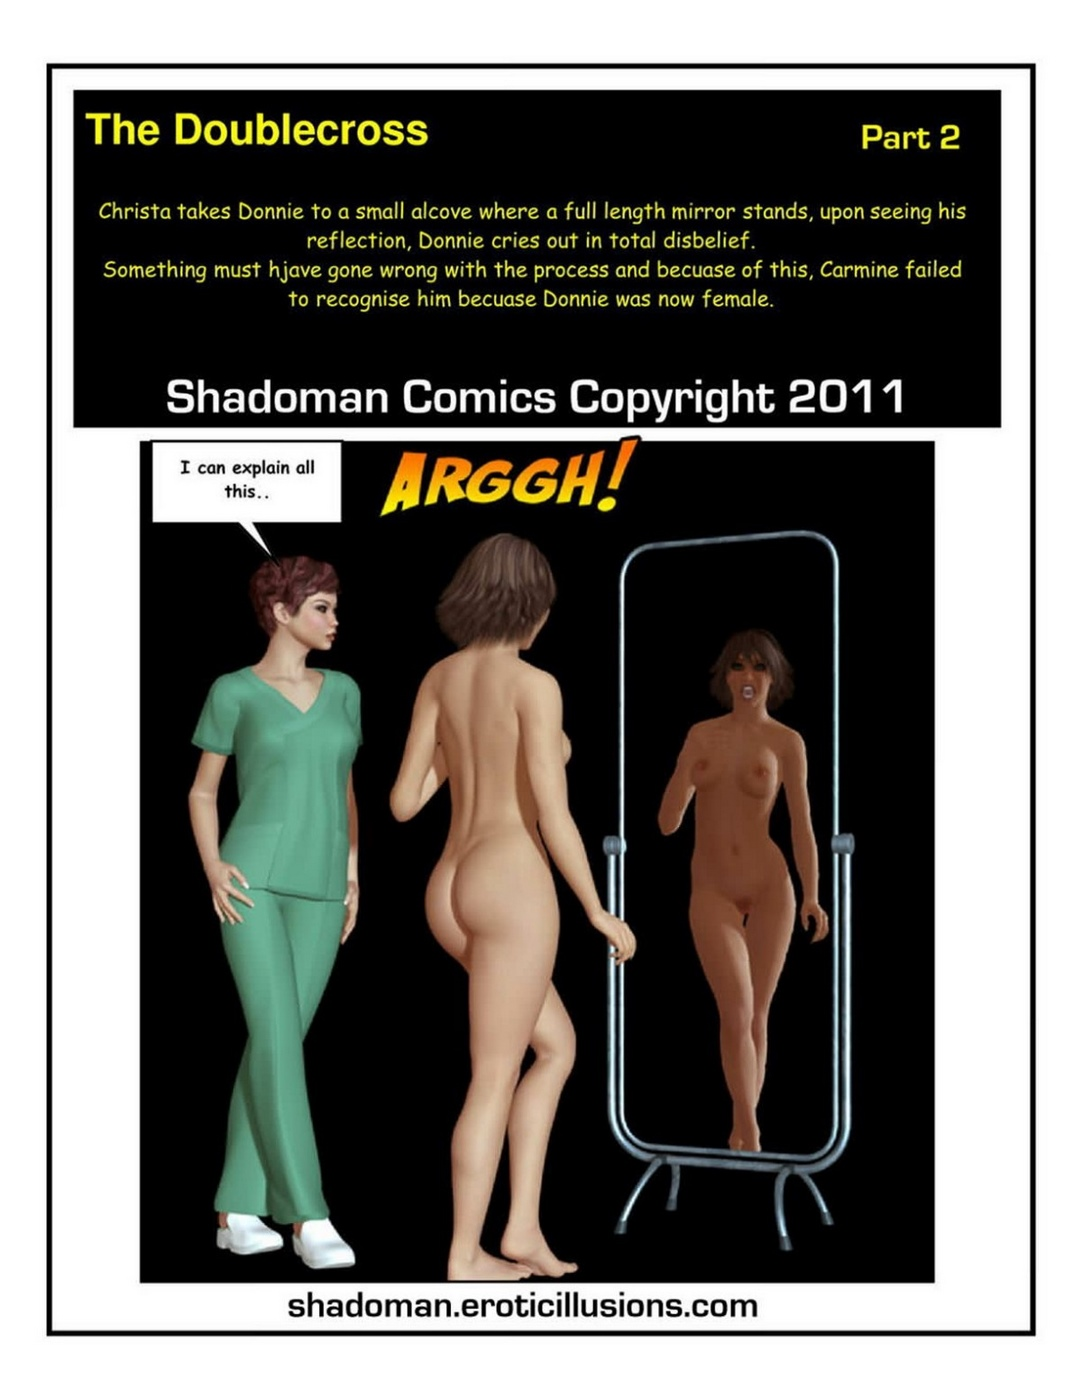 Shadoman – The doublecross 2 image 01